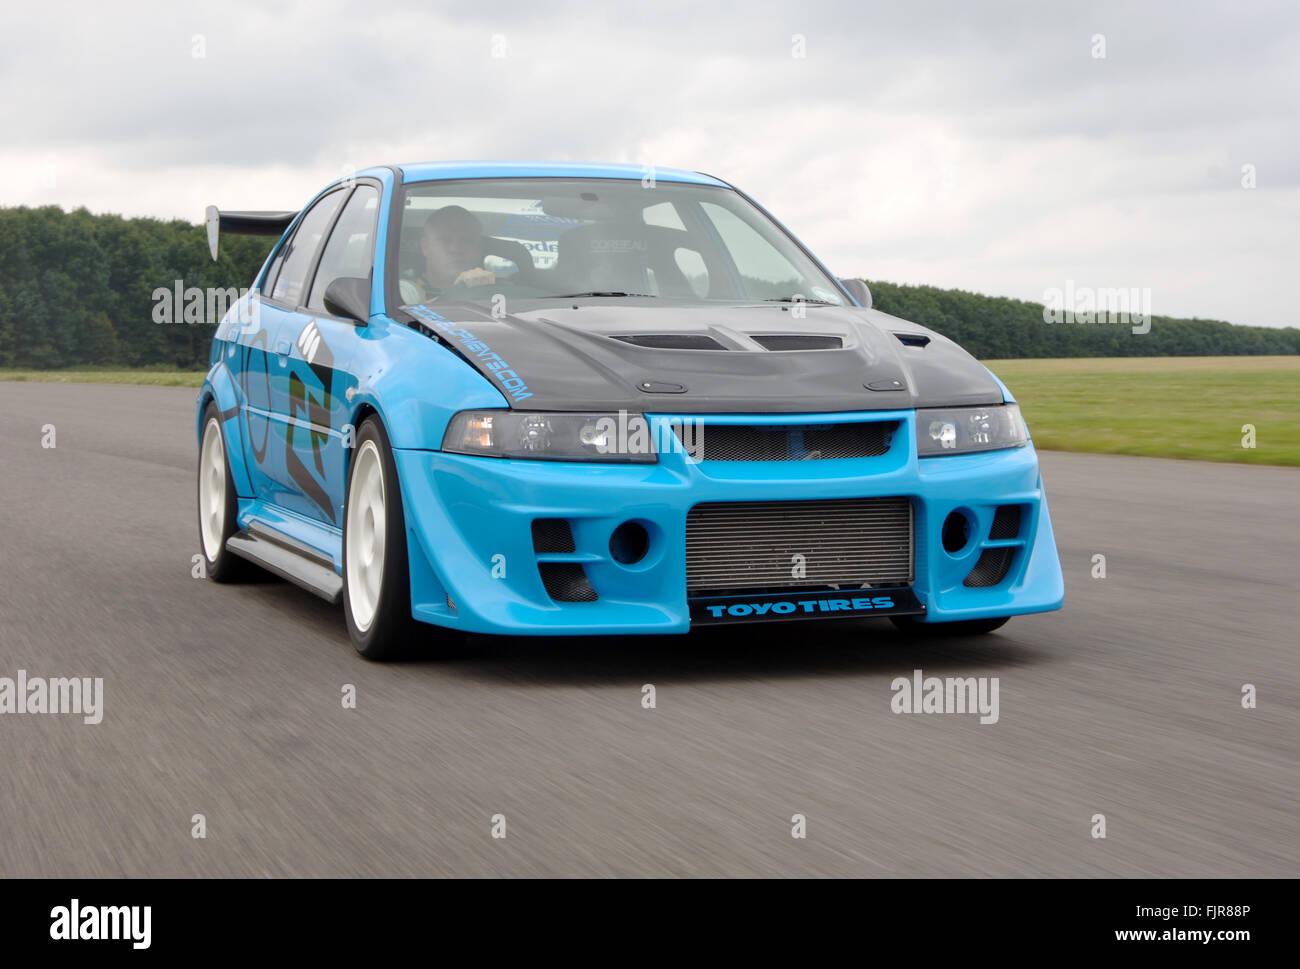 Mitsubishi Evo XI 1999 - 2001 modified for racing - Stock Image